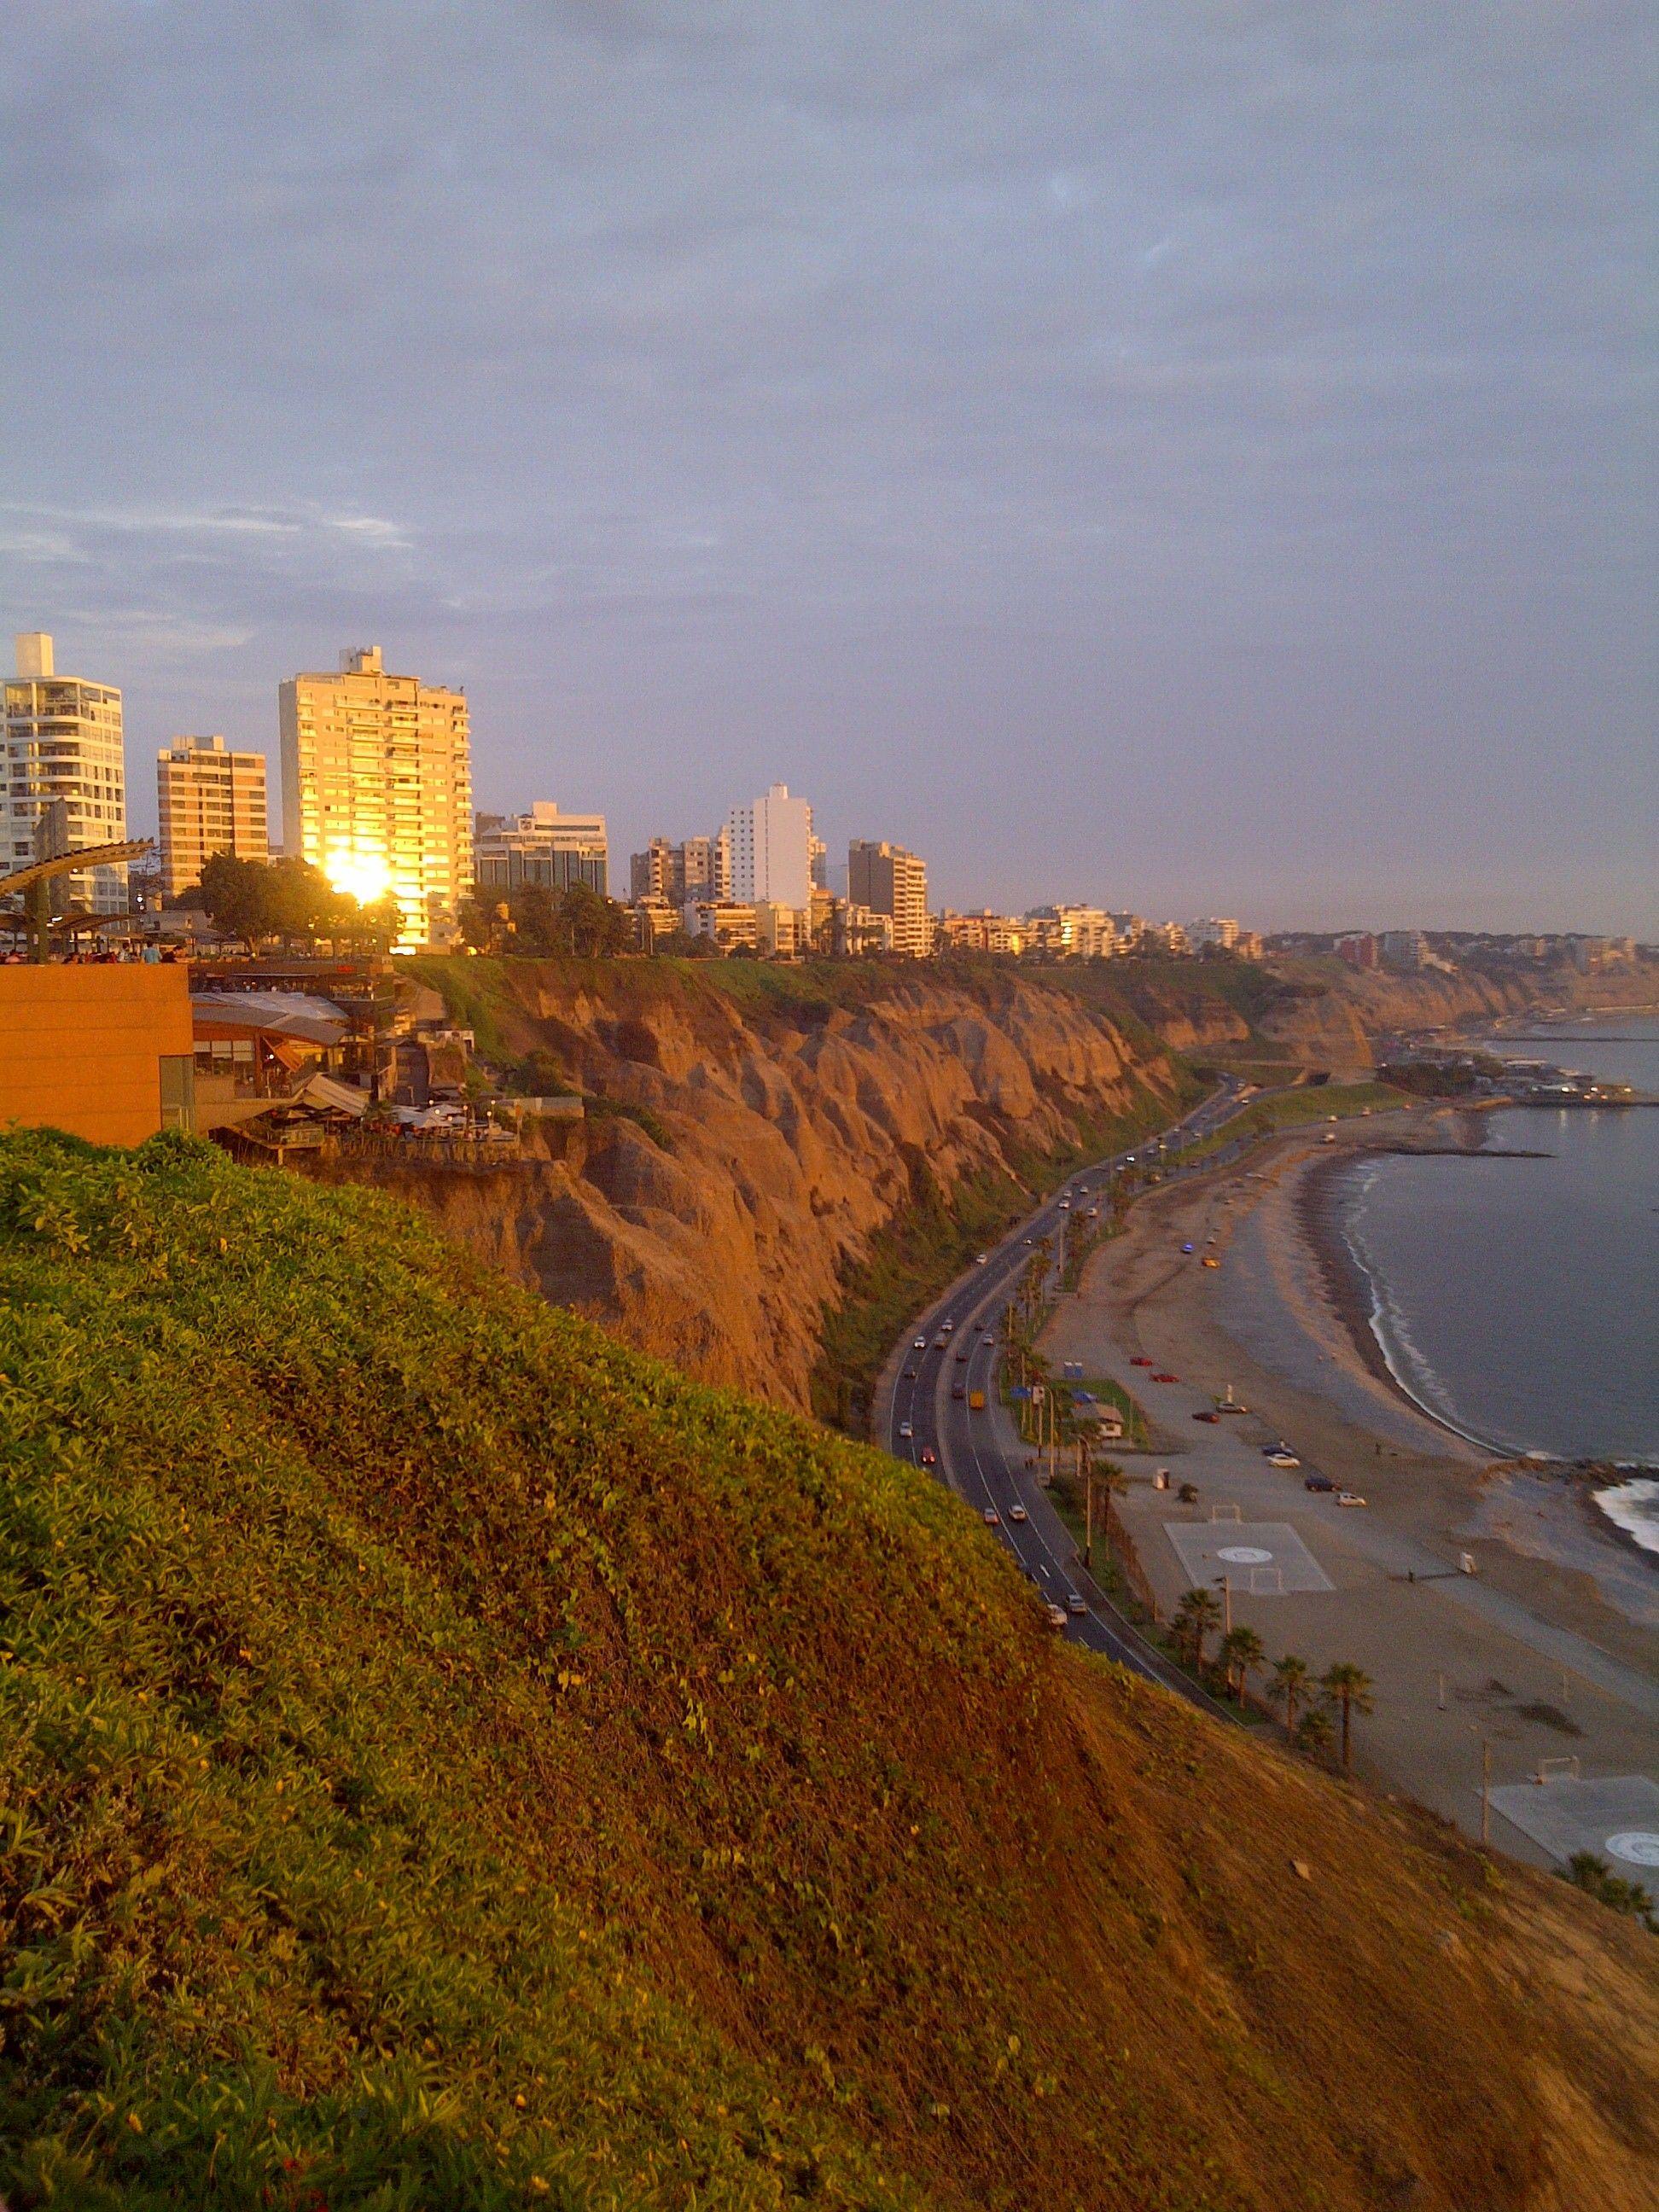 sunset costa verde miraflores lima perú peru ❤